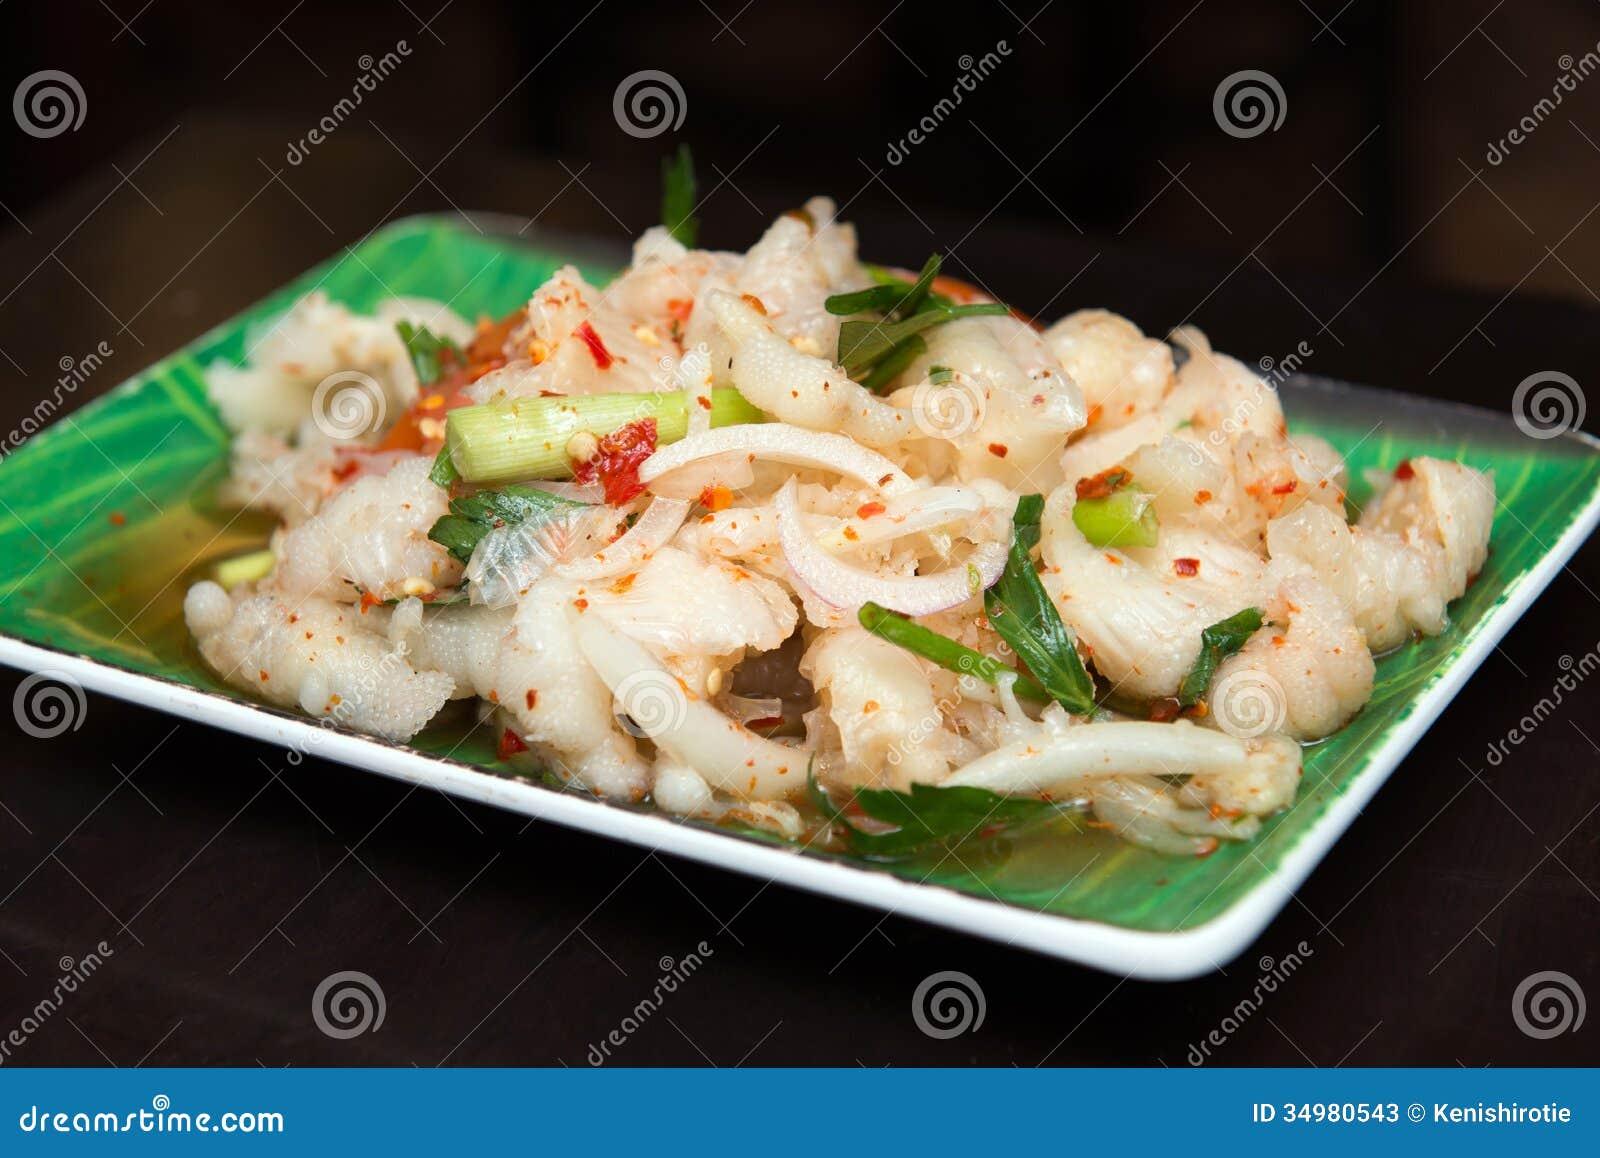 Thai Style Spicy Chicken Feet Salad Stock Photos - Image: 34980543